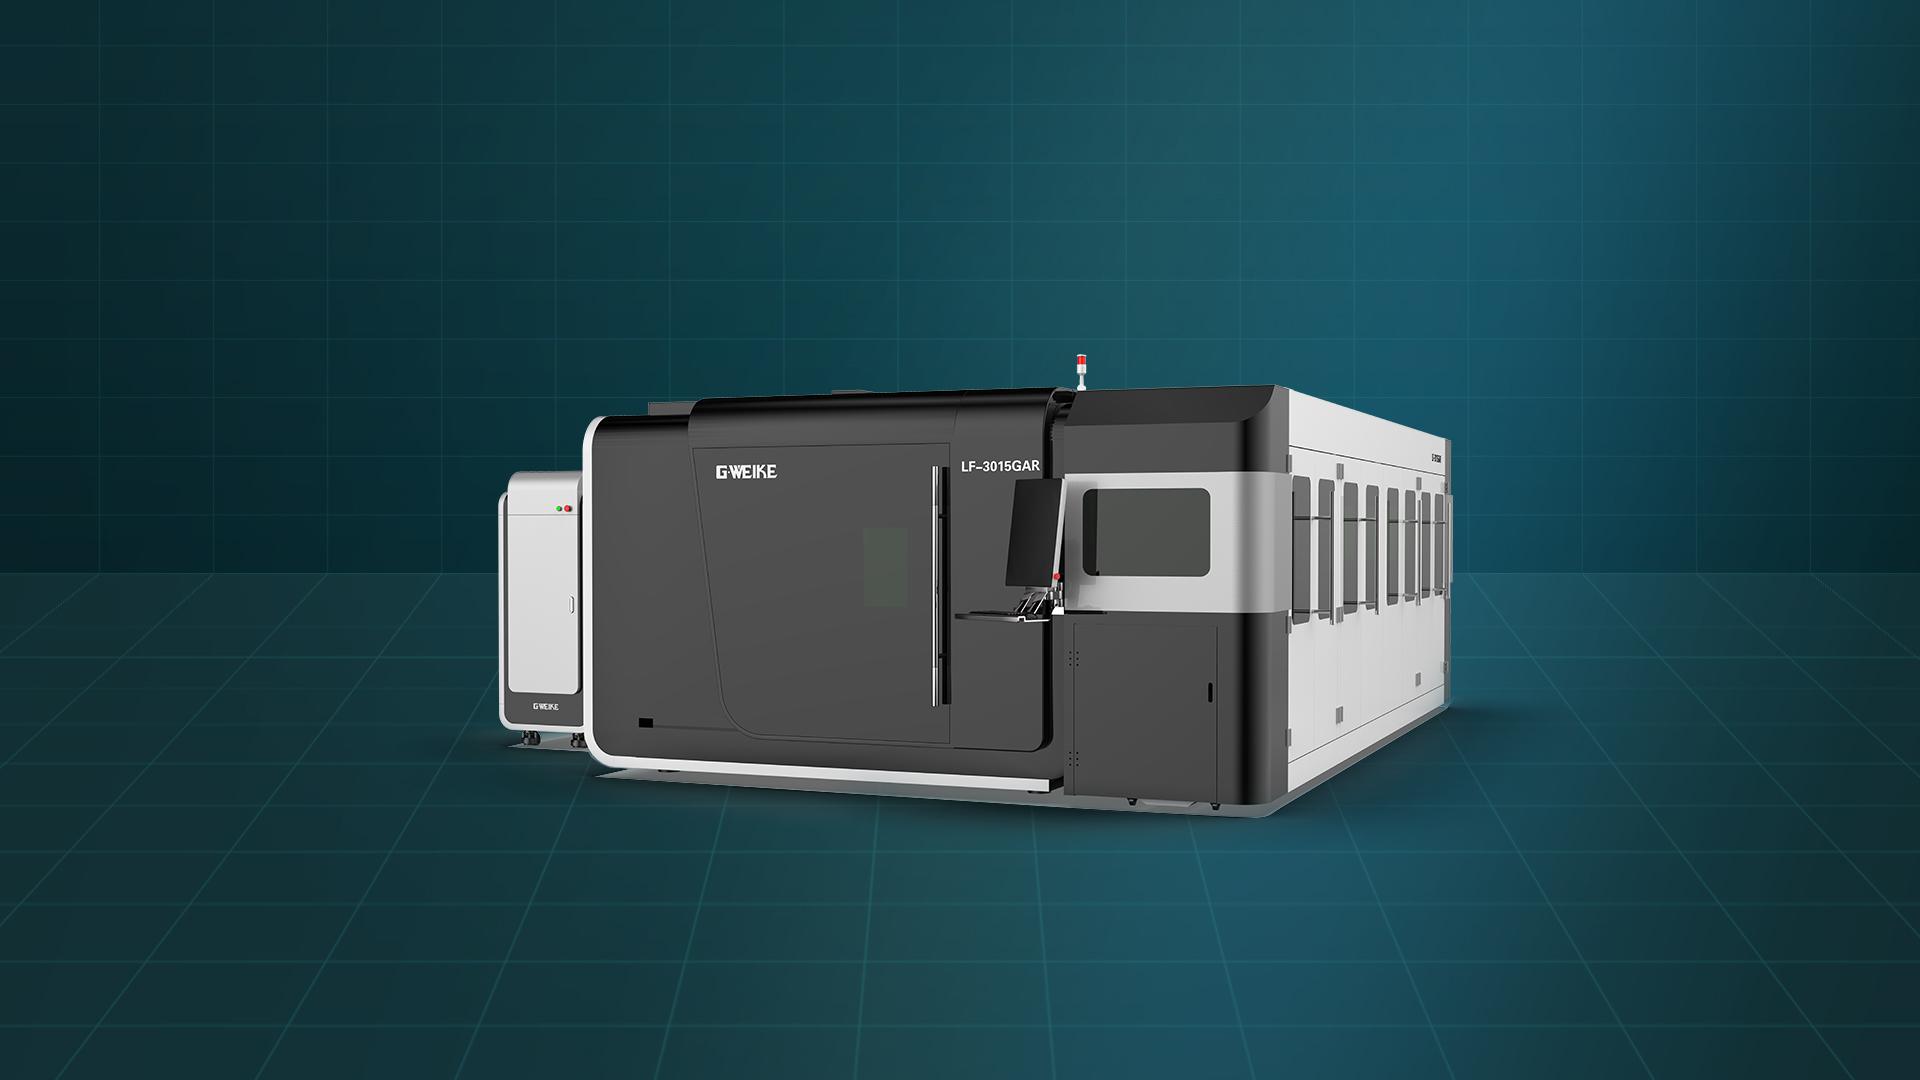 Máy cắt laser fiber bàn đôi buồng kín LF-3015GAR